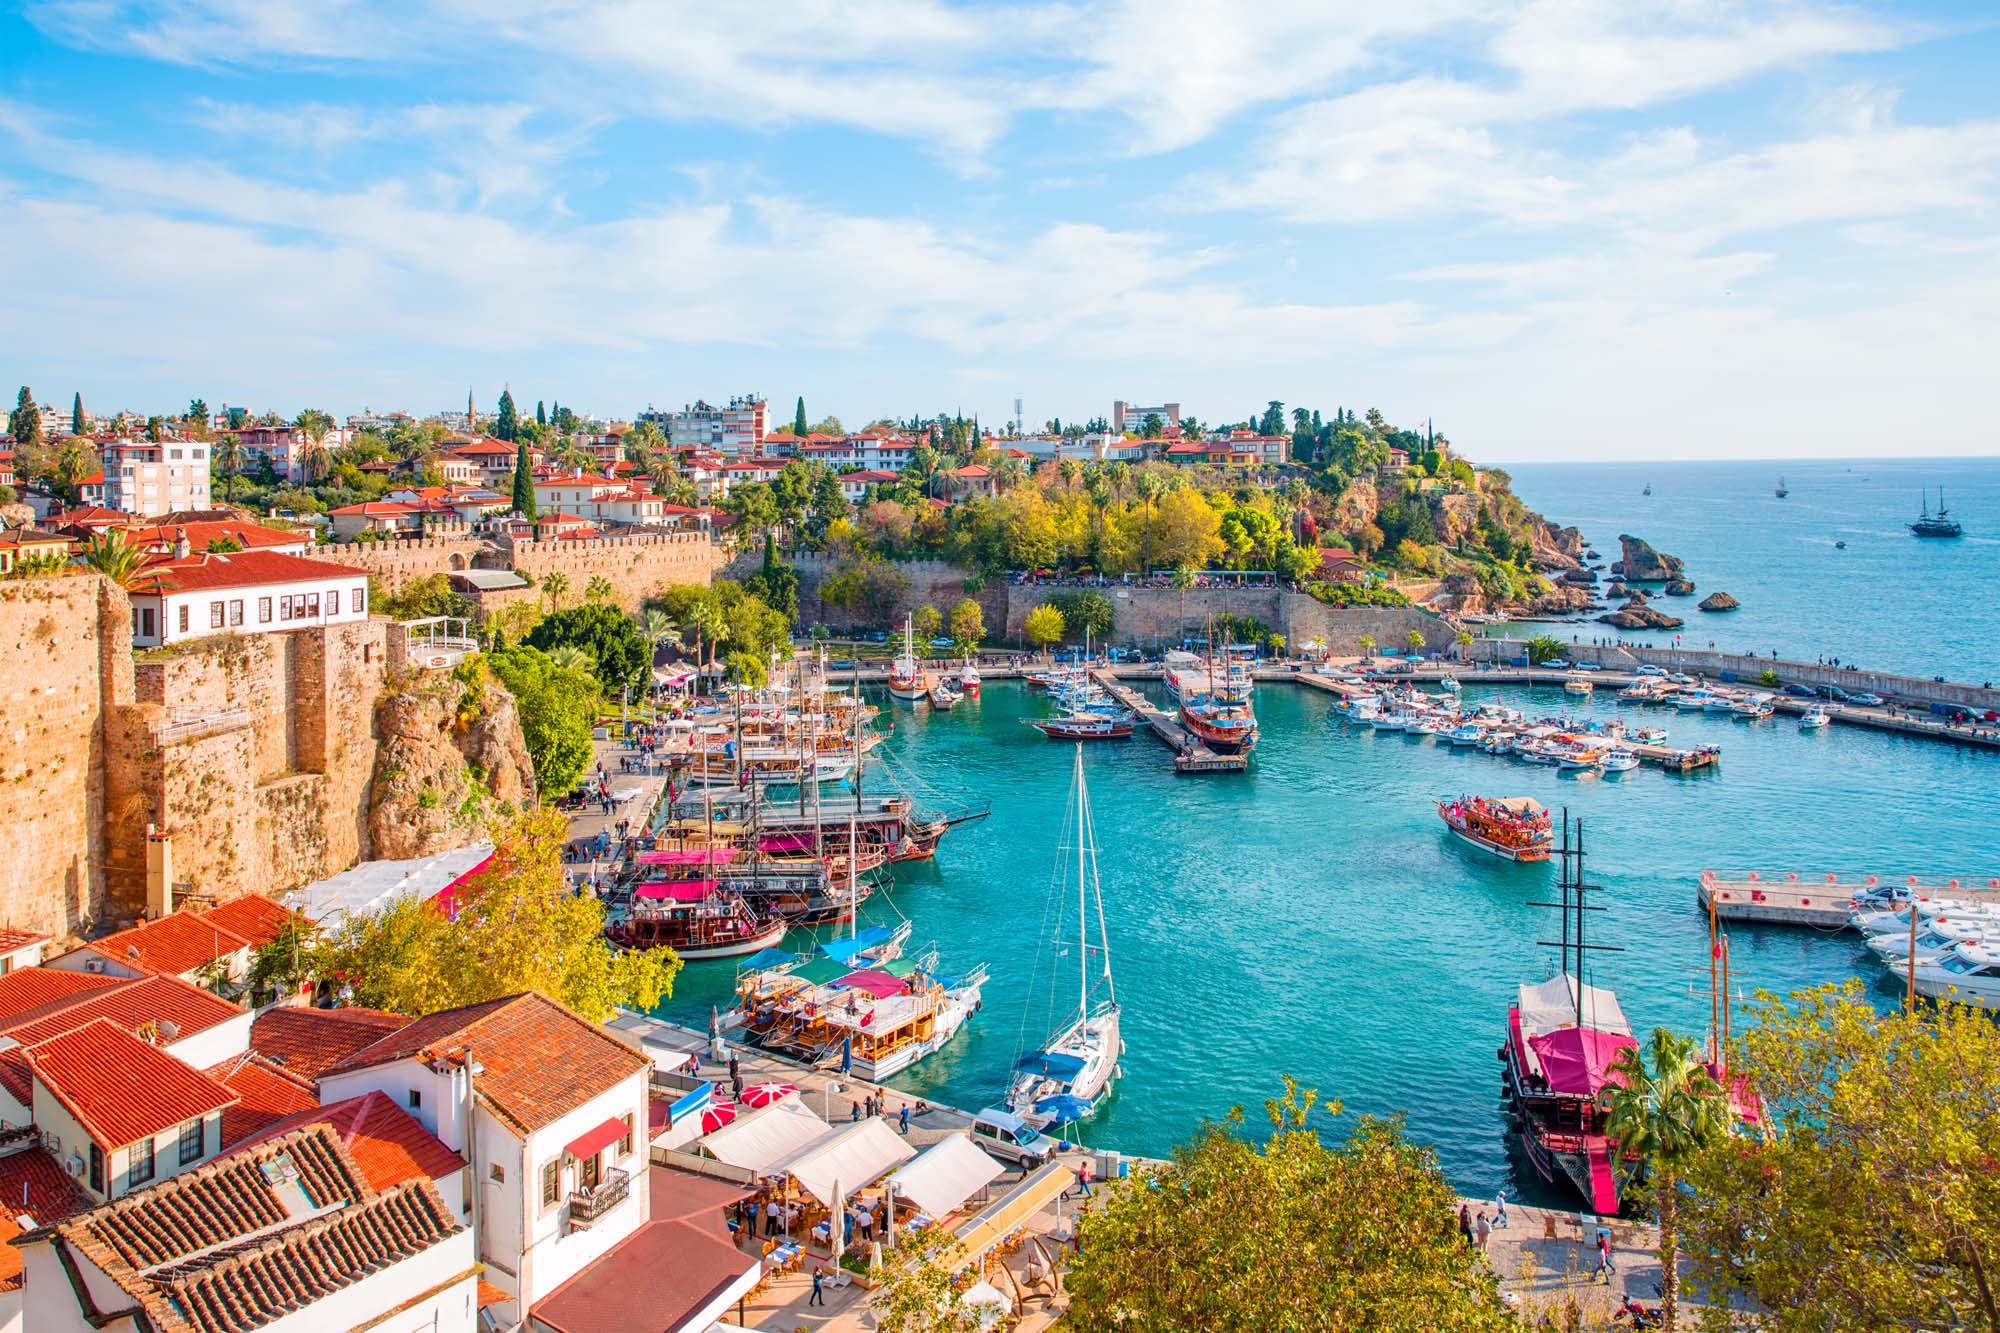 Antalya, Turkey eid summer travel destination ideas